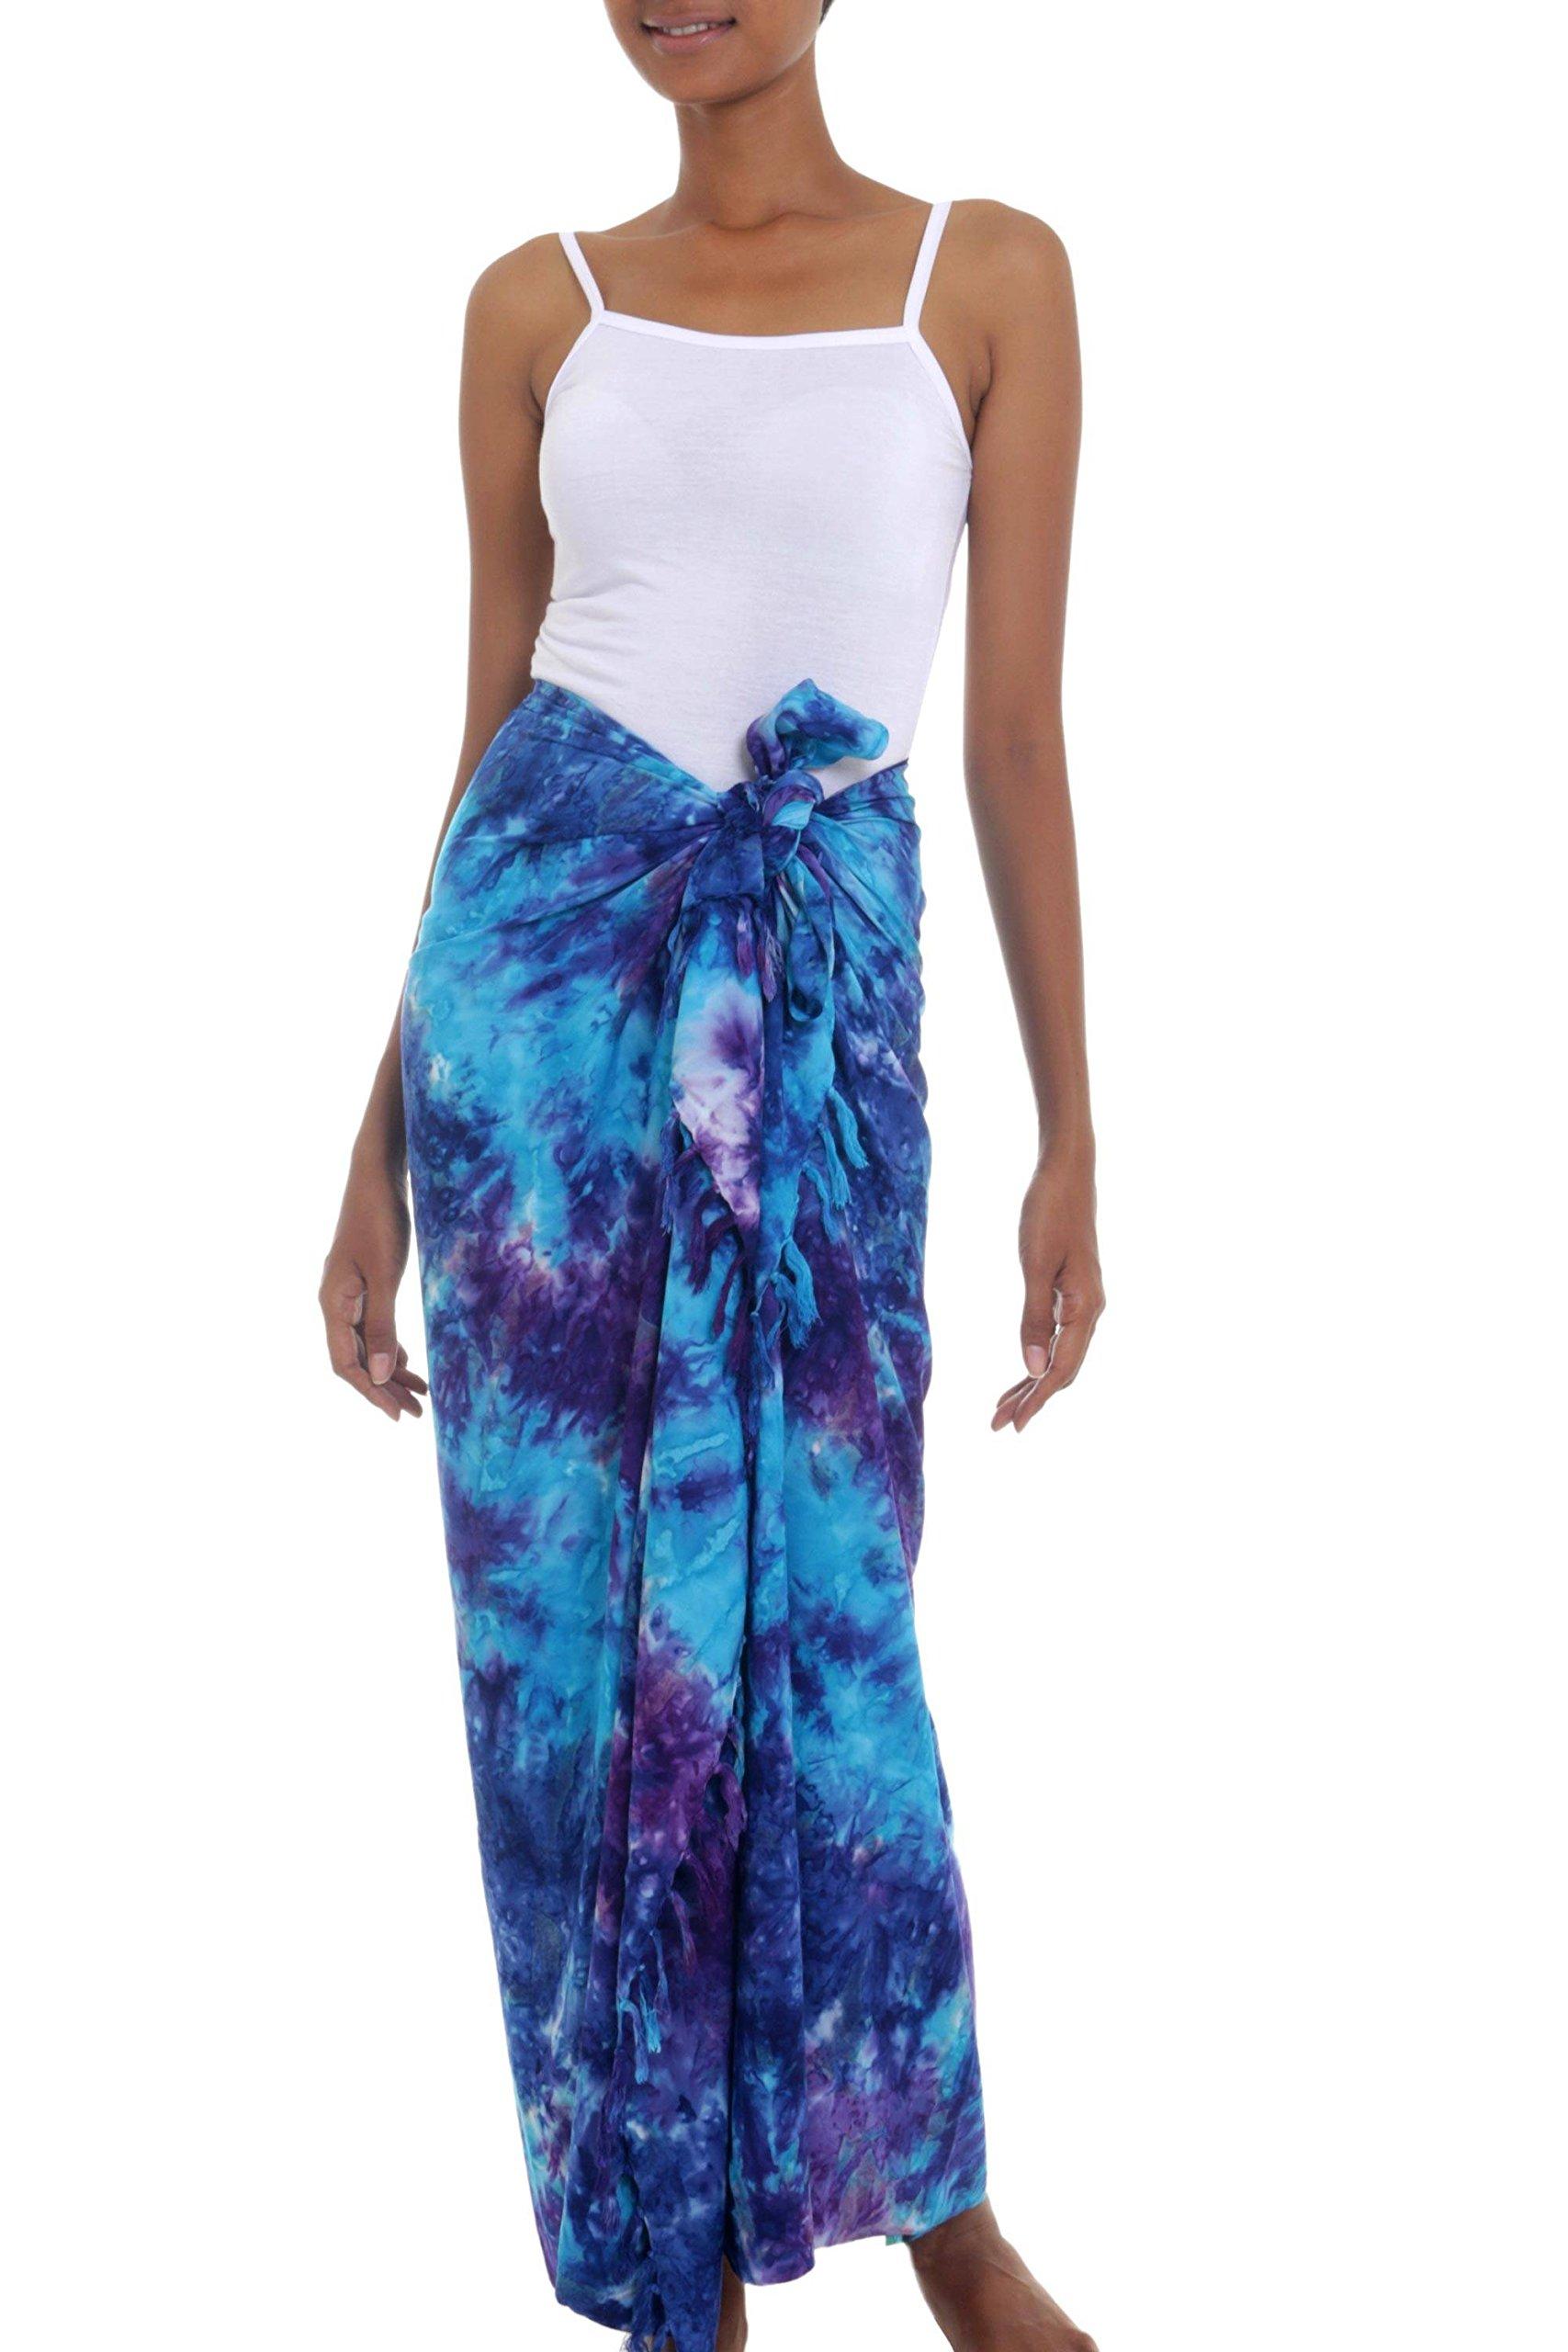 NOVICA Blue Purple Tie Dye Rayon Sarong Beach Swimsuit Cover Up 'Sea Glass'